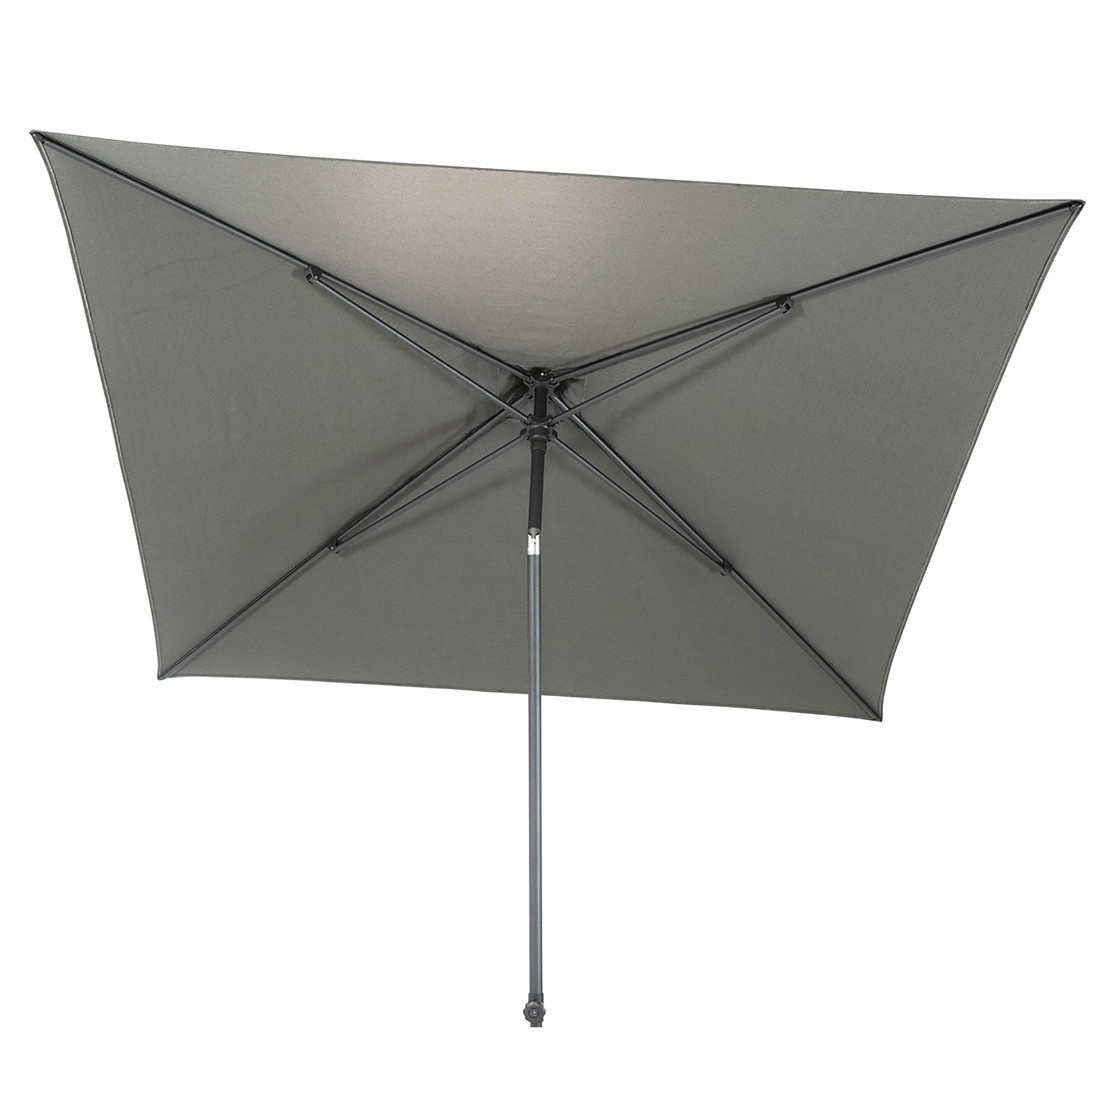 Azzurro 250 x 250 cm Mid Grey